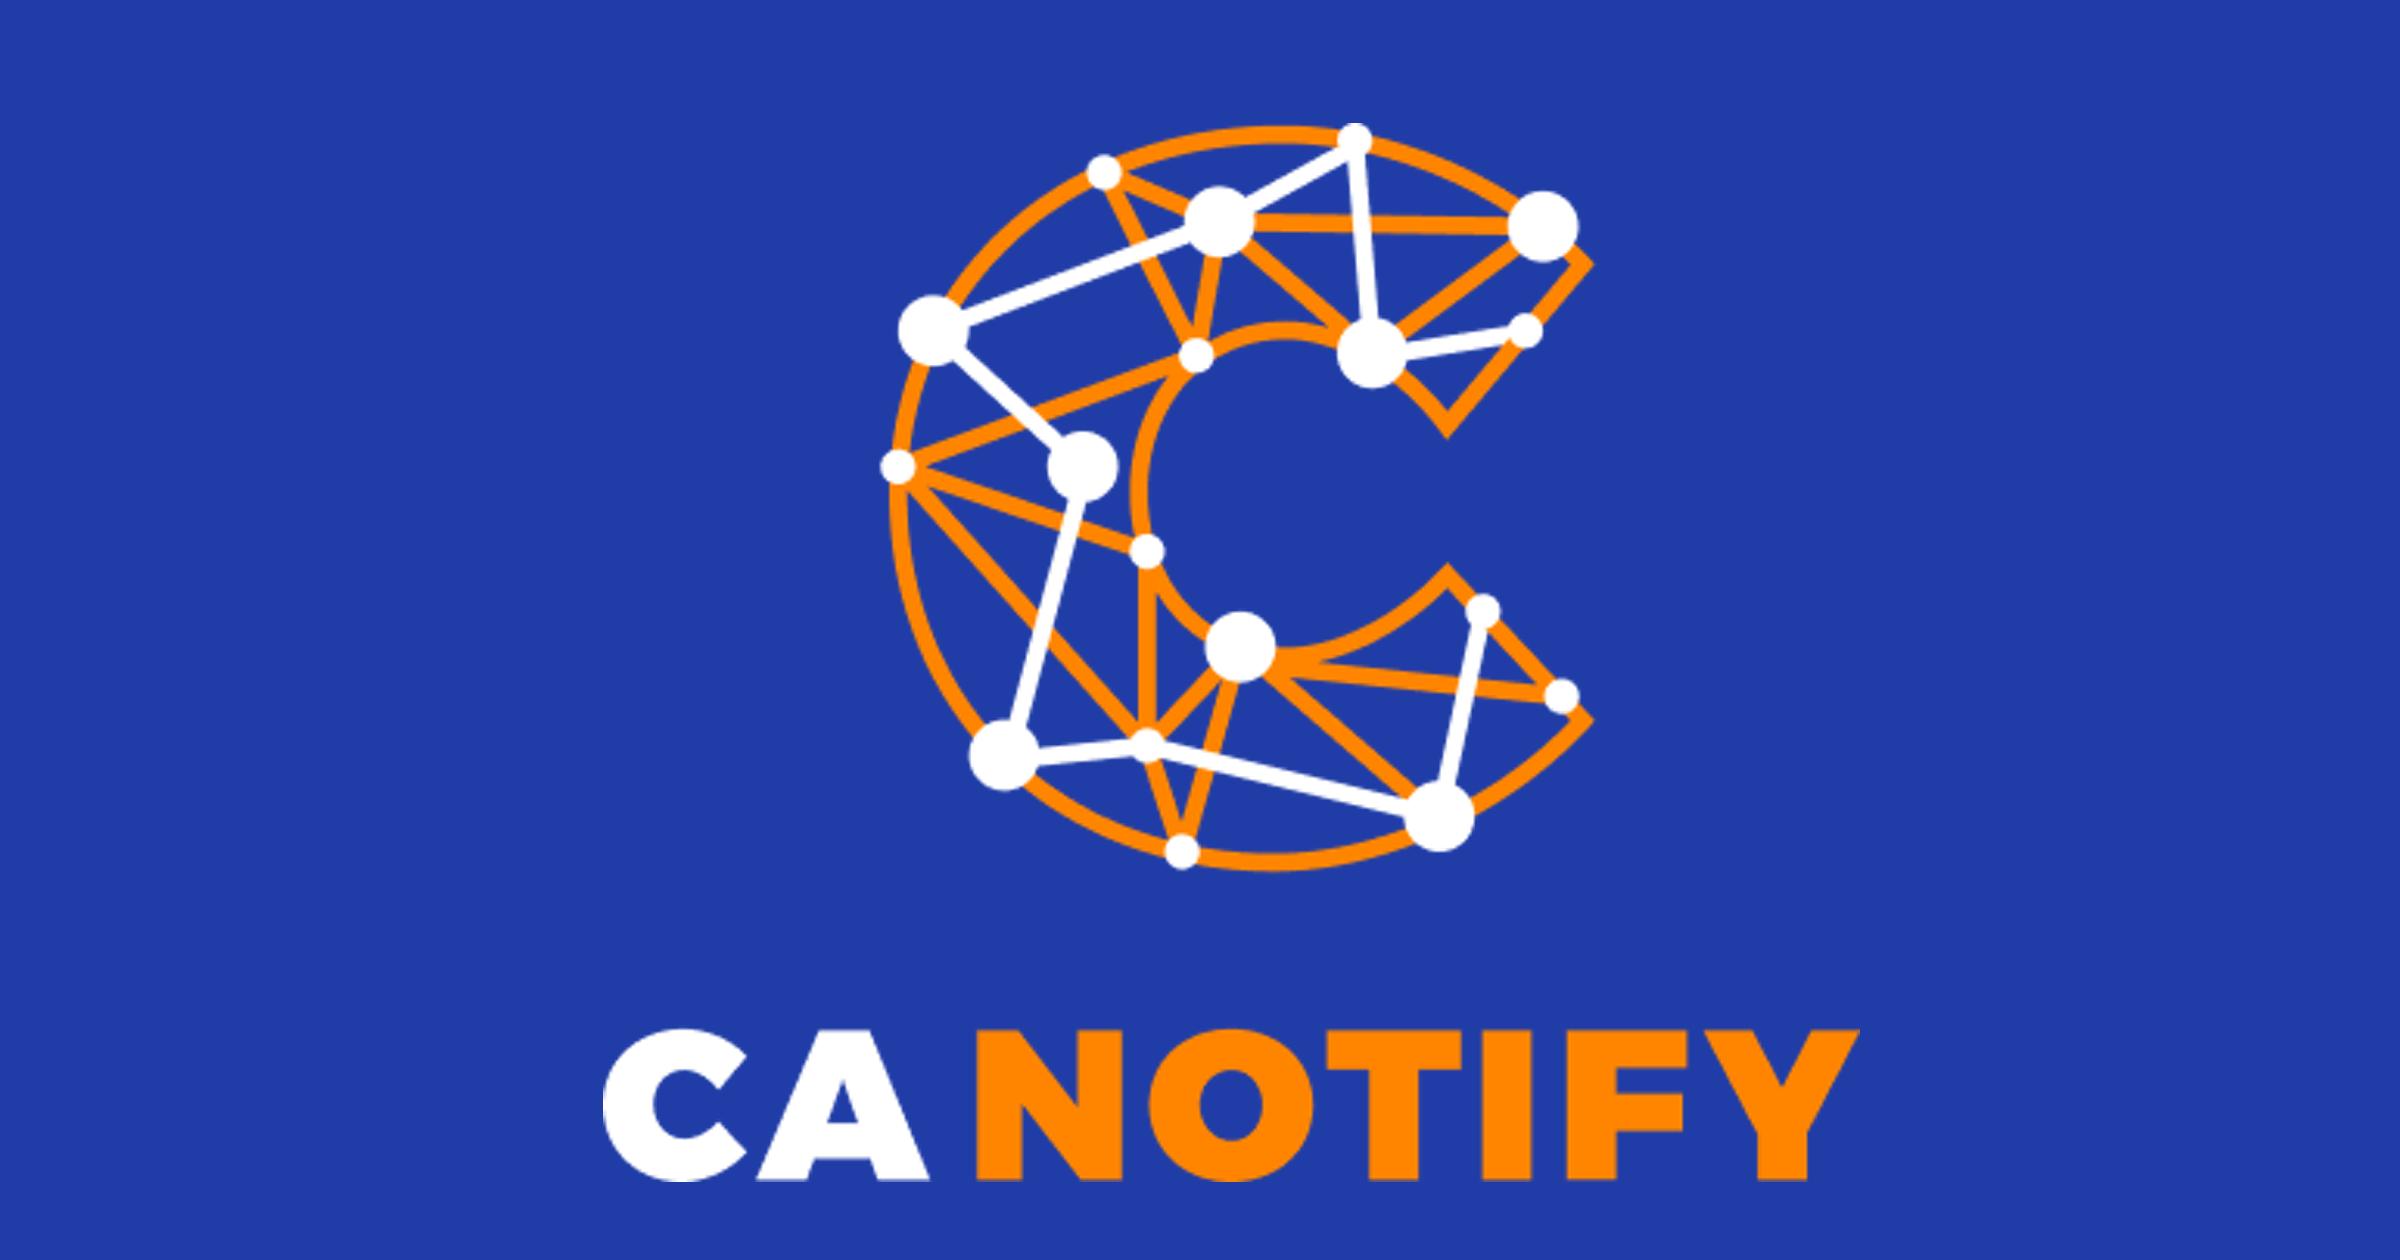 CA Notify COVID-19 exposure notification